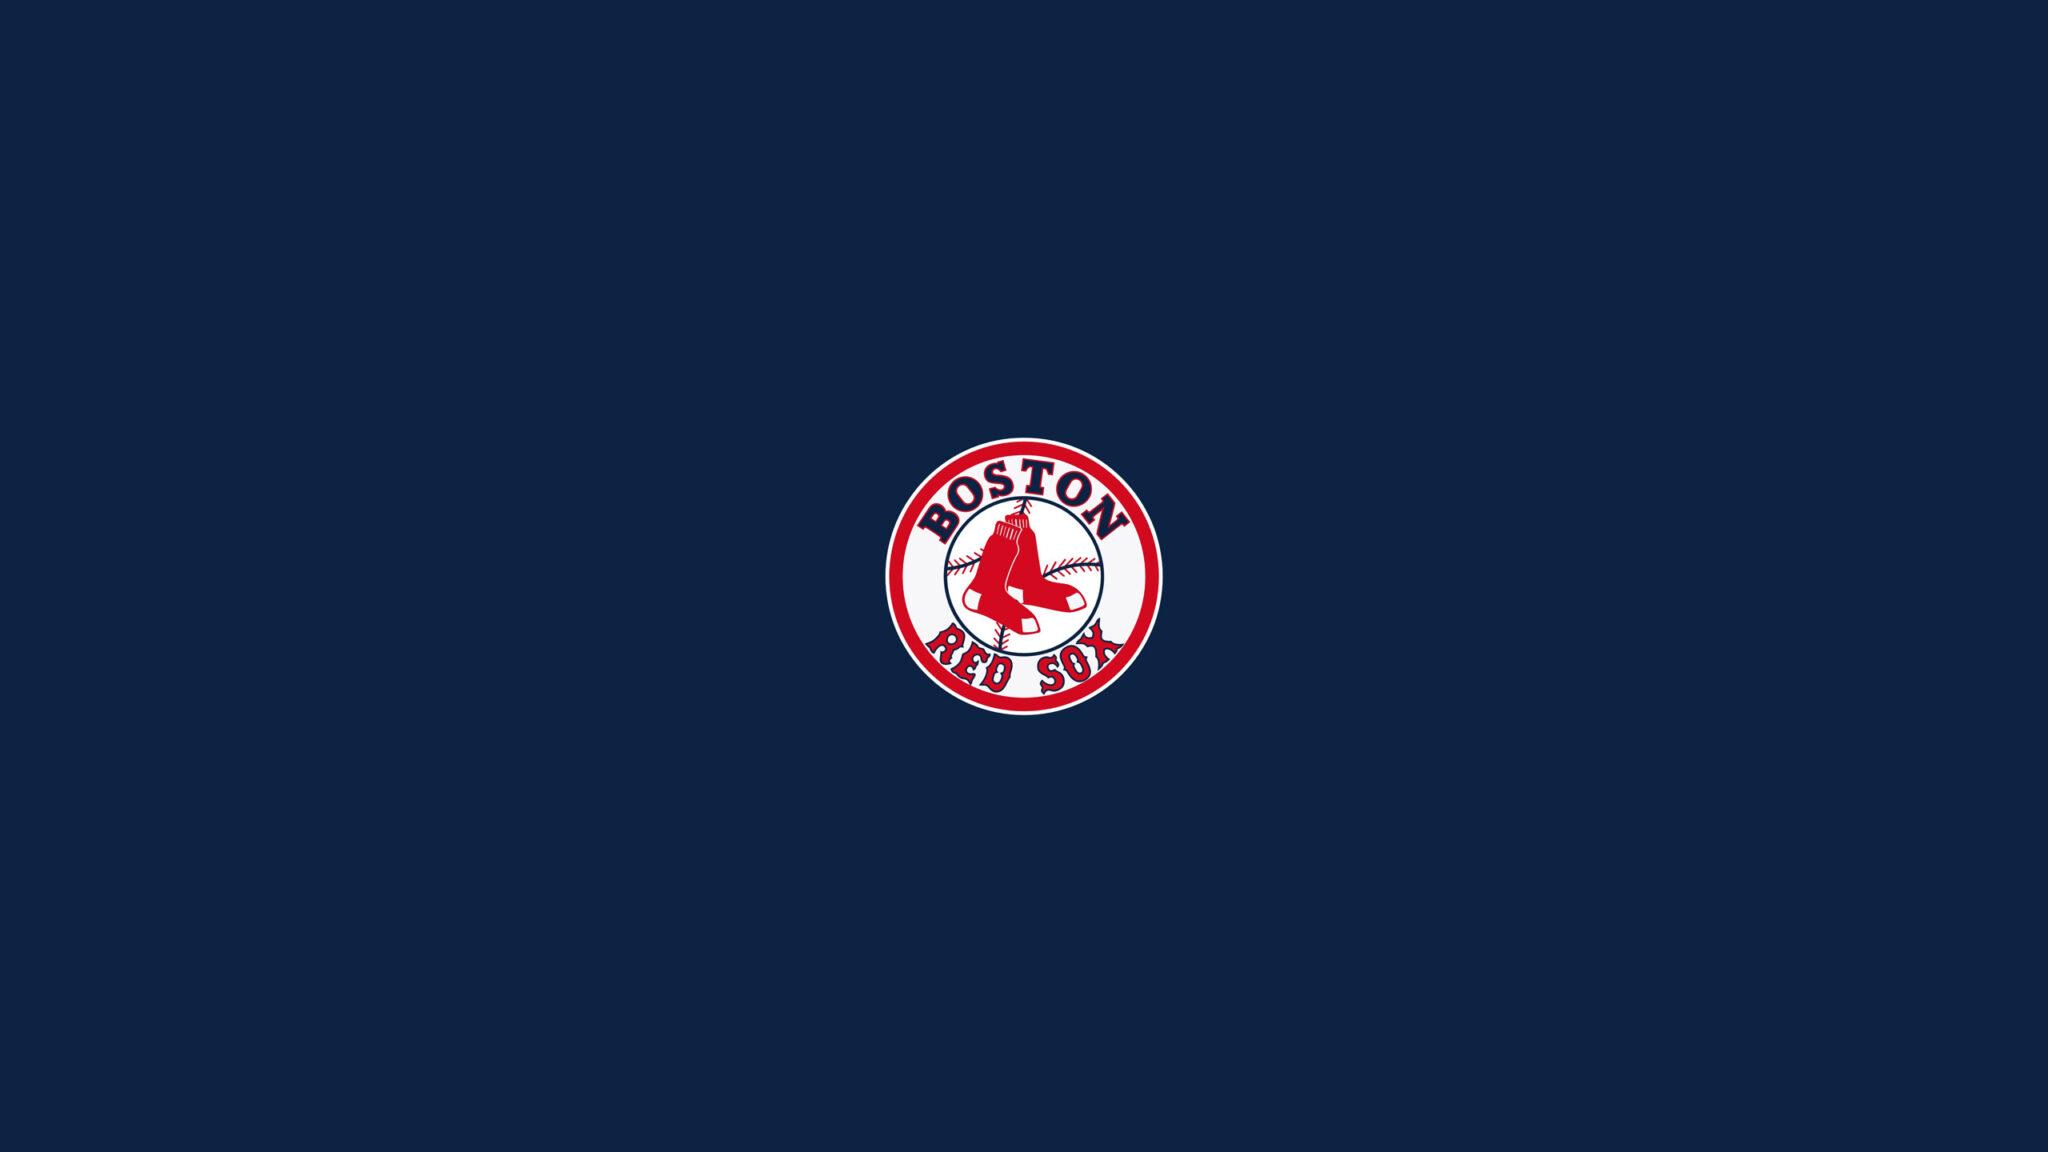 Blue-Red-Sox-Wallpaper-HQ - Windows Mode